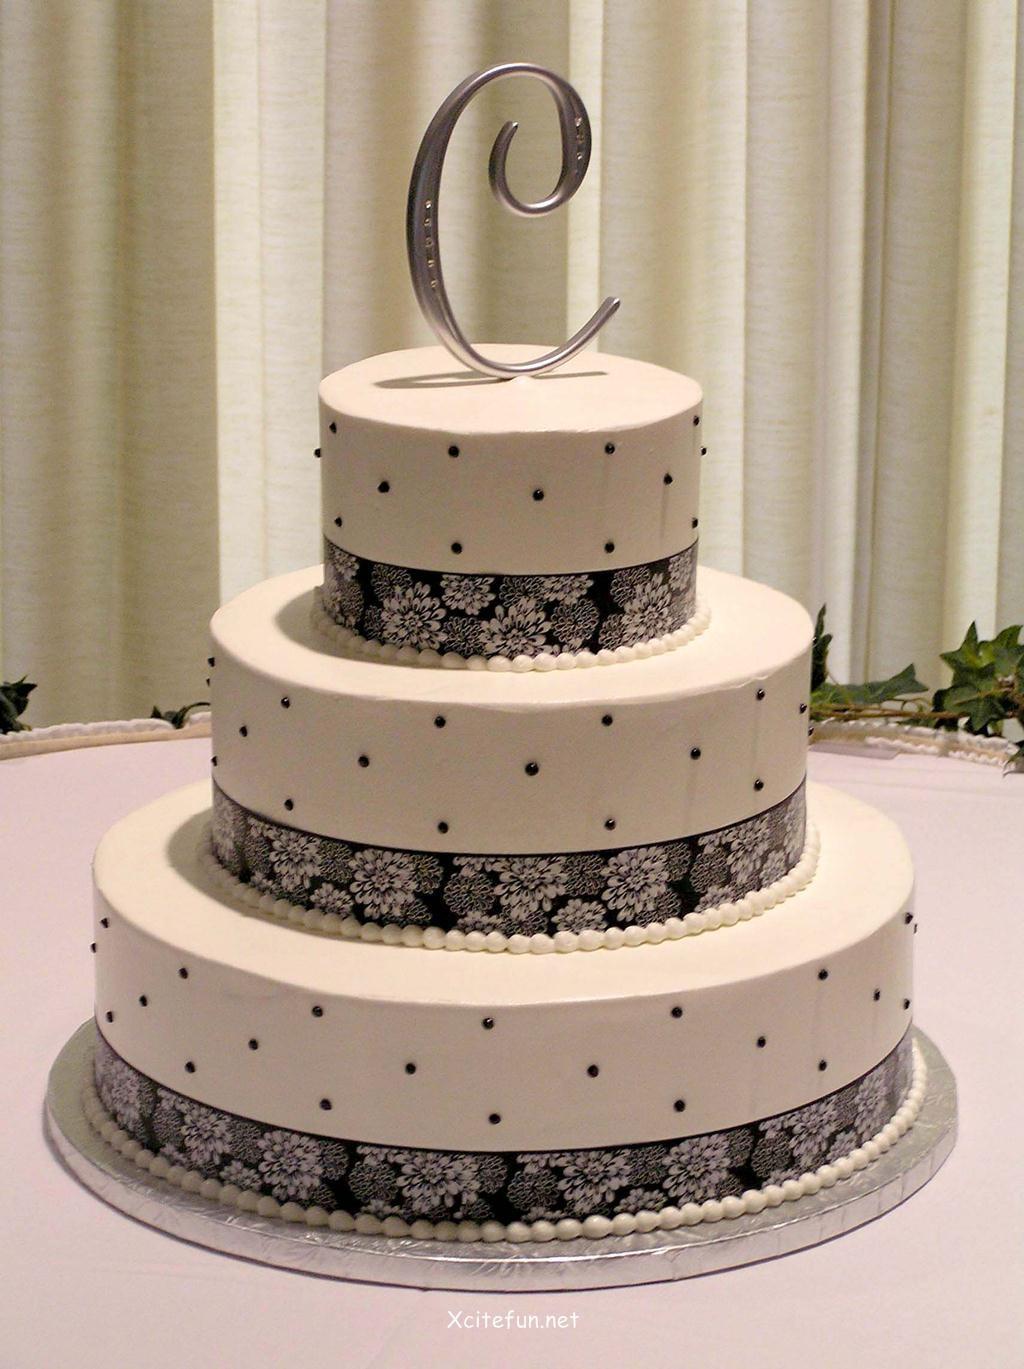 Wedding Cakes Decor  Wedding Cakes Decorating Ideas XciteFun